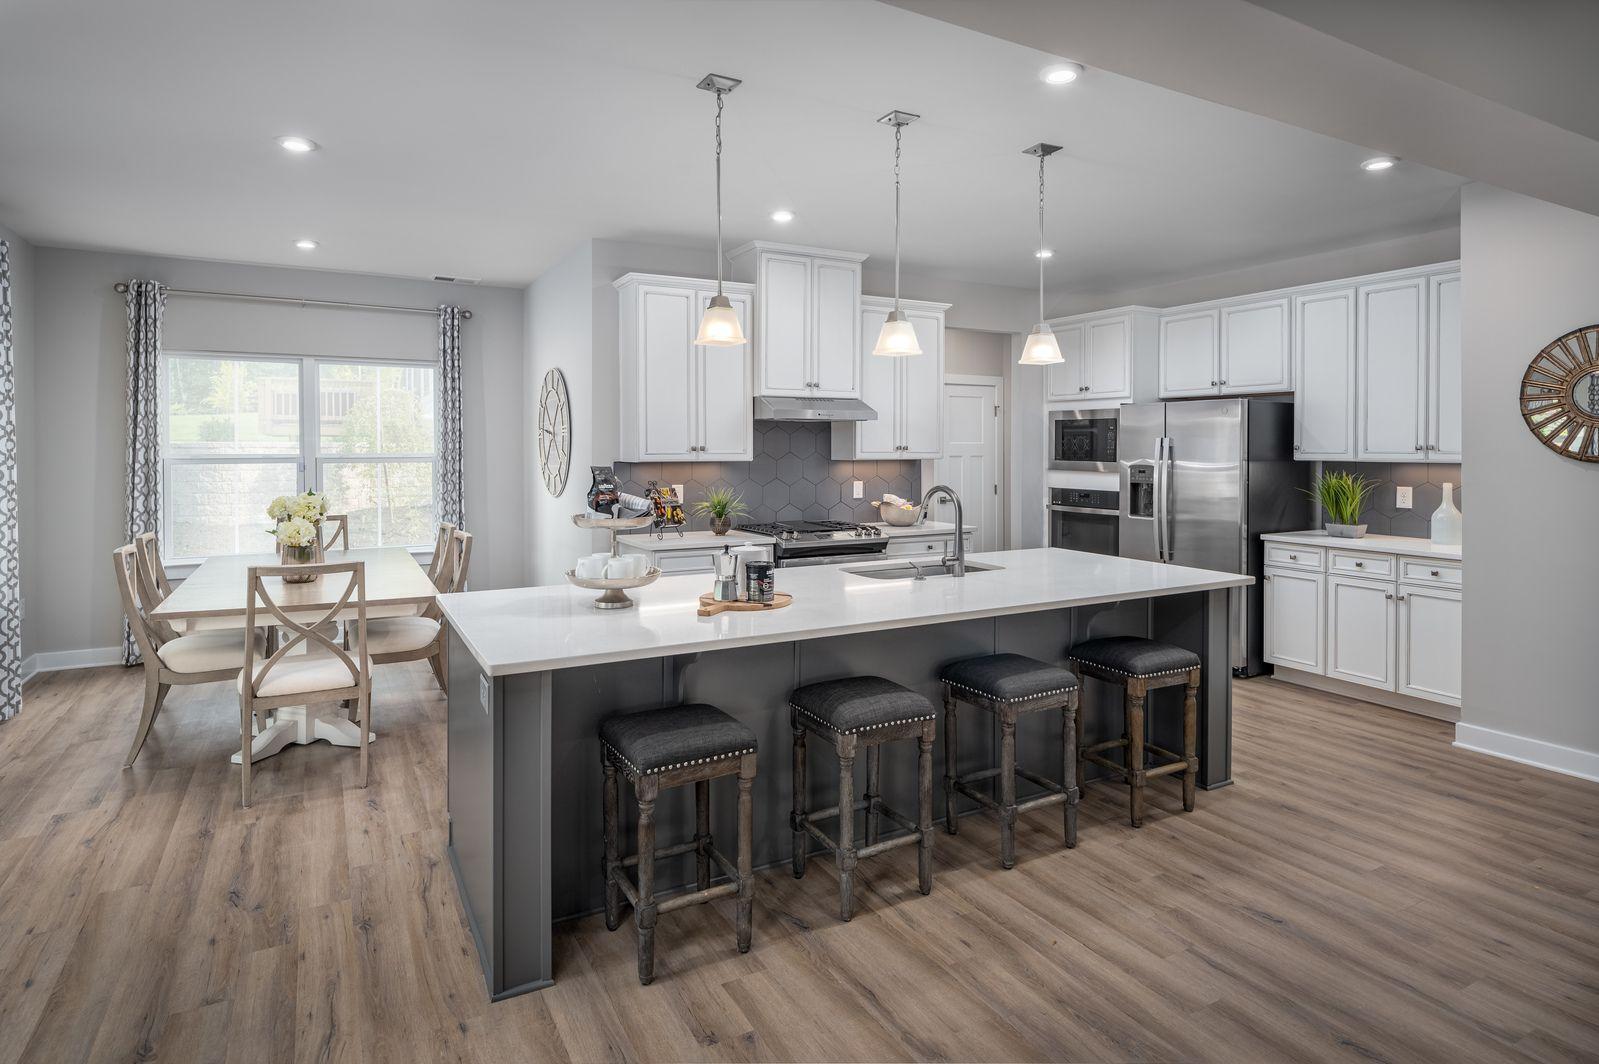 Kitchen featured in the Seneca By Ryan Homes in Nashville, TN